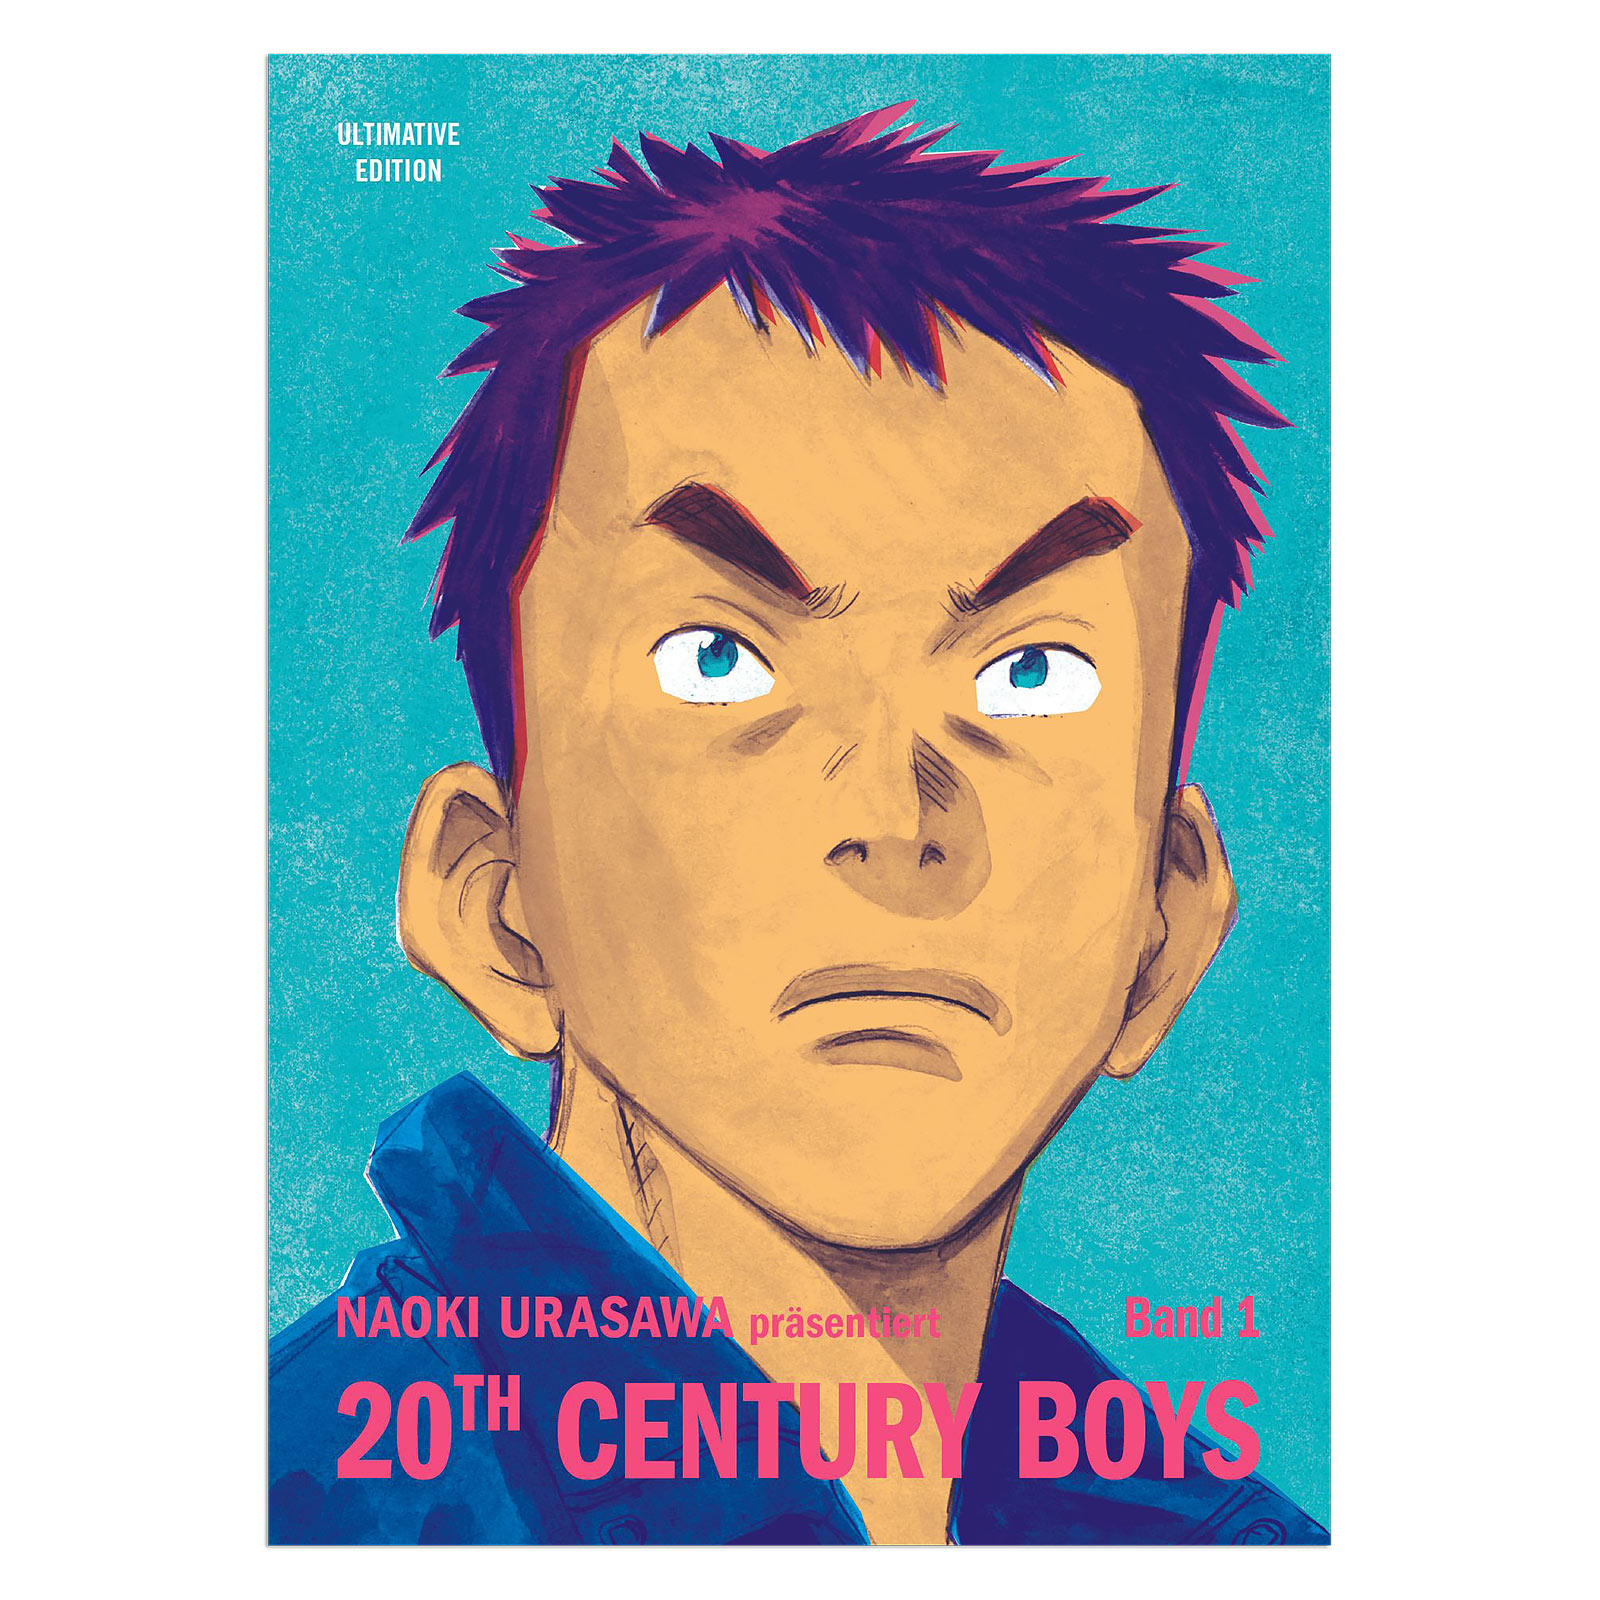 20th Century Boys - Band 1 Taschenbuch Ultimate Edition